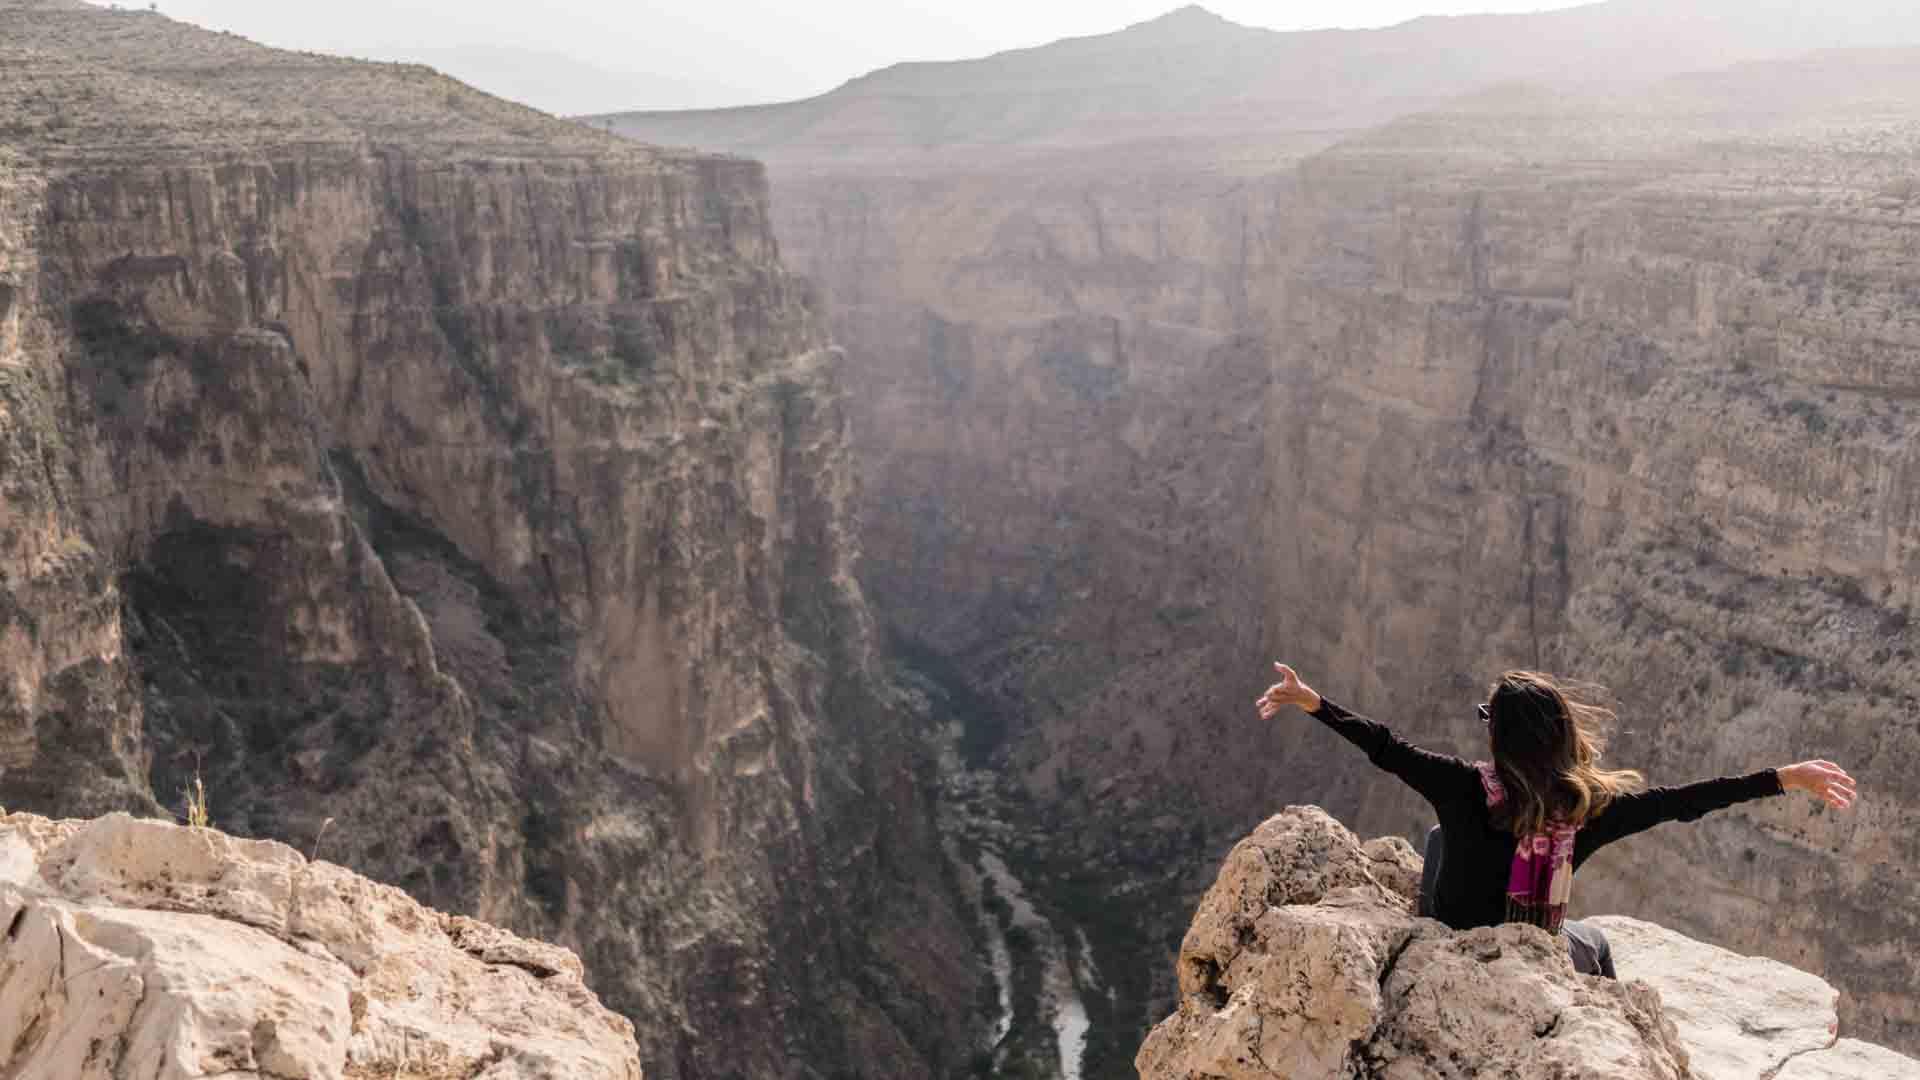 SerialHikers stop autostop world monde tour hitchhiking aventure adventure alternative travel voyage sans avion no fly Iran Firouzabad grand canyon hayghar